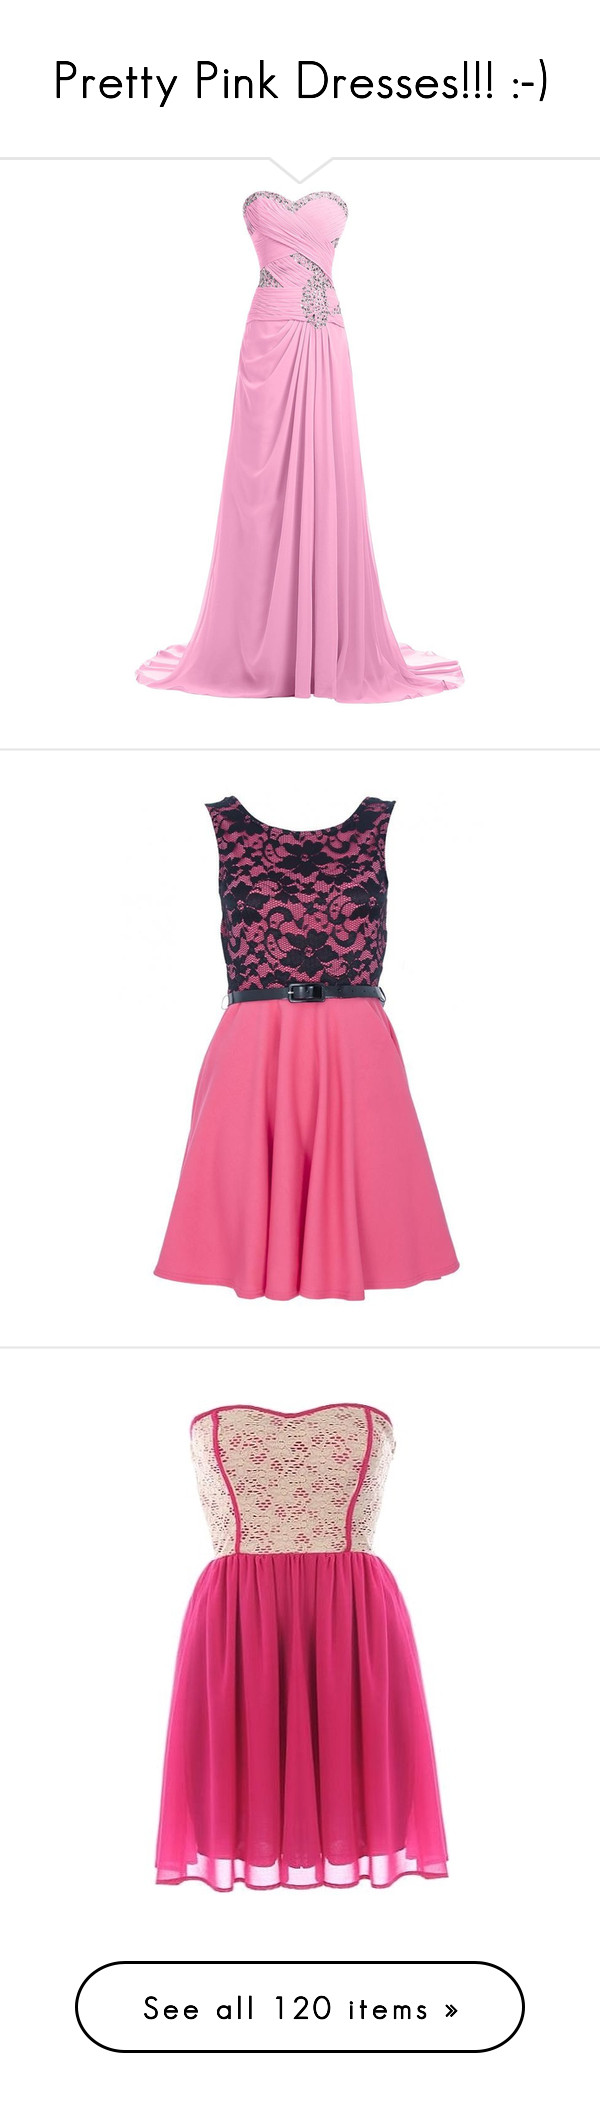 Pretty Pink Dresses!!! :-)\